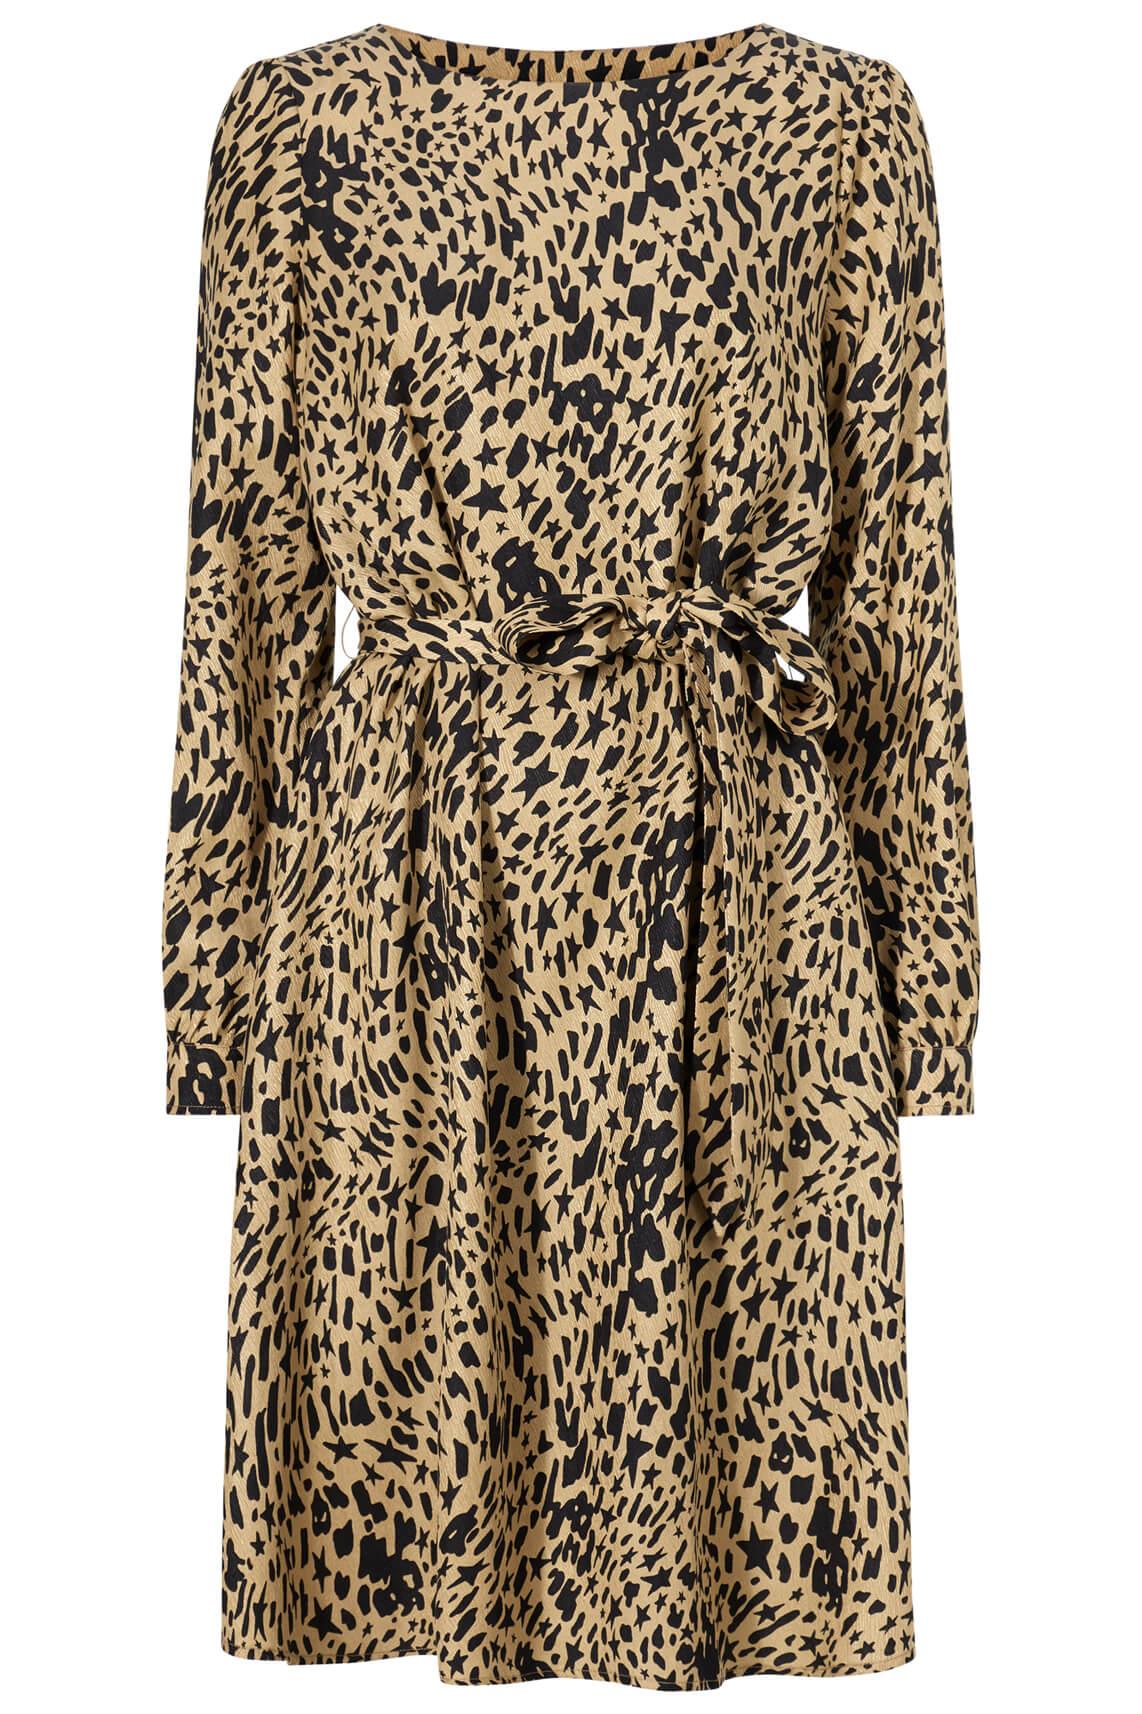 Fabienne Chapot Dames Helen jurk met print Bruin